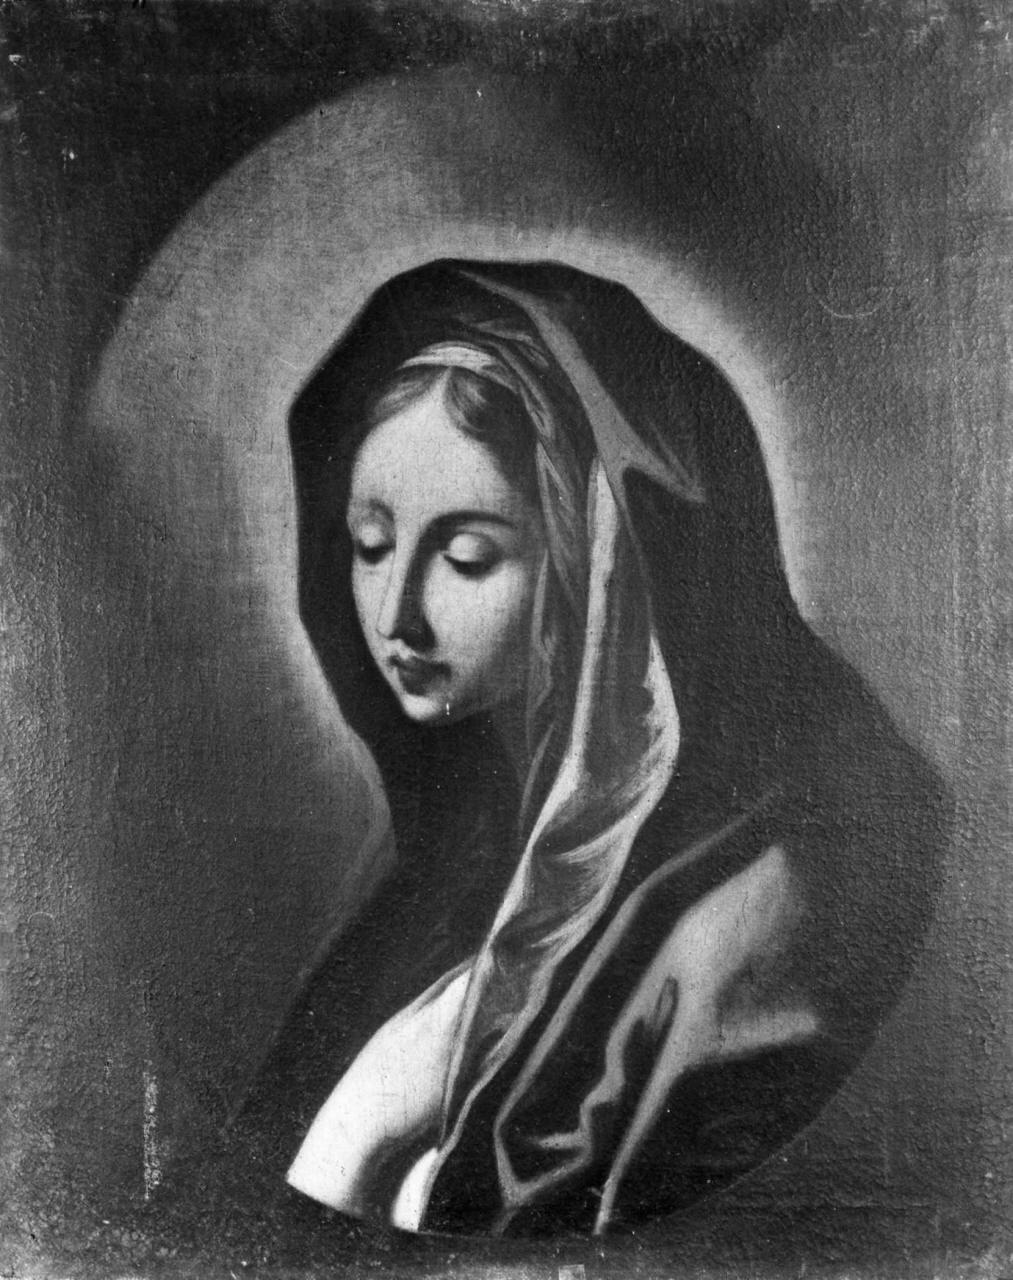 Madonna (dipinto) - ambito fiorentino (sec. XVII, sec. XVIII)